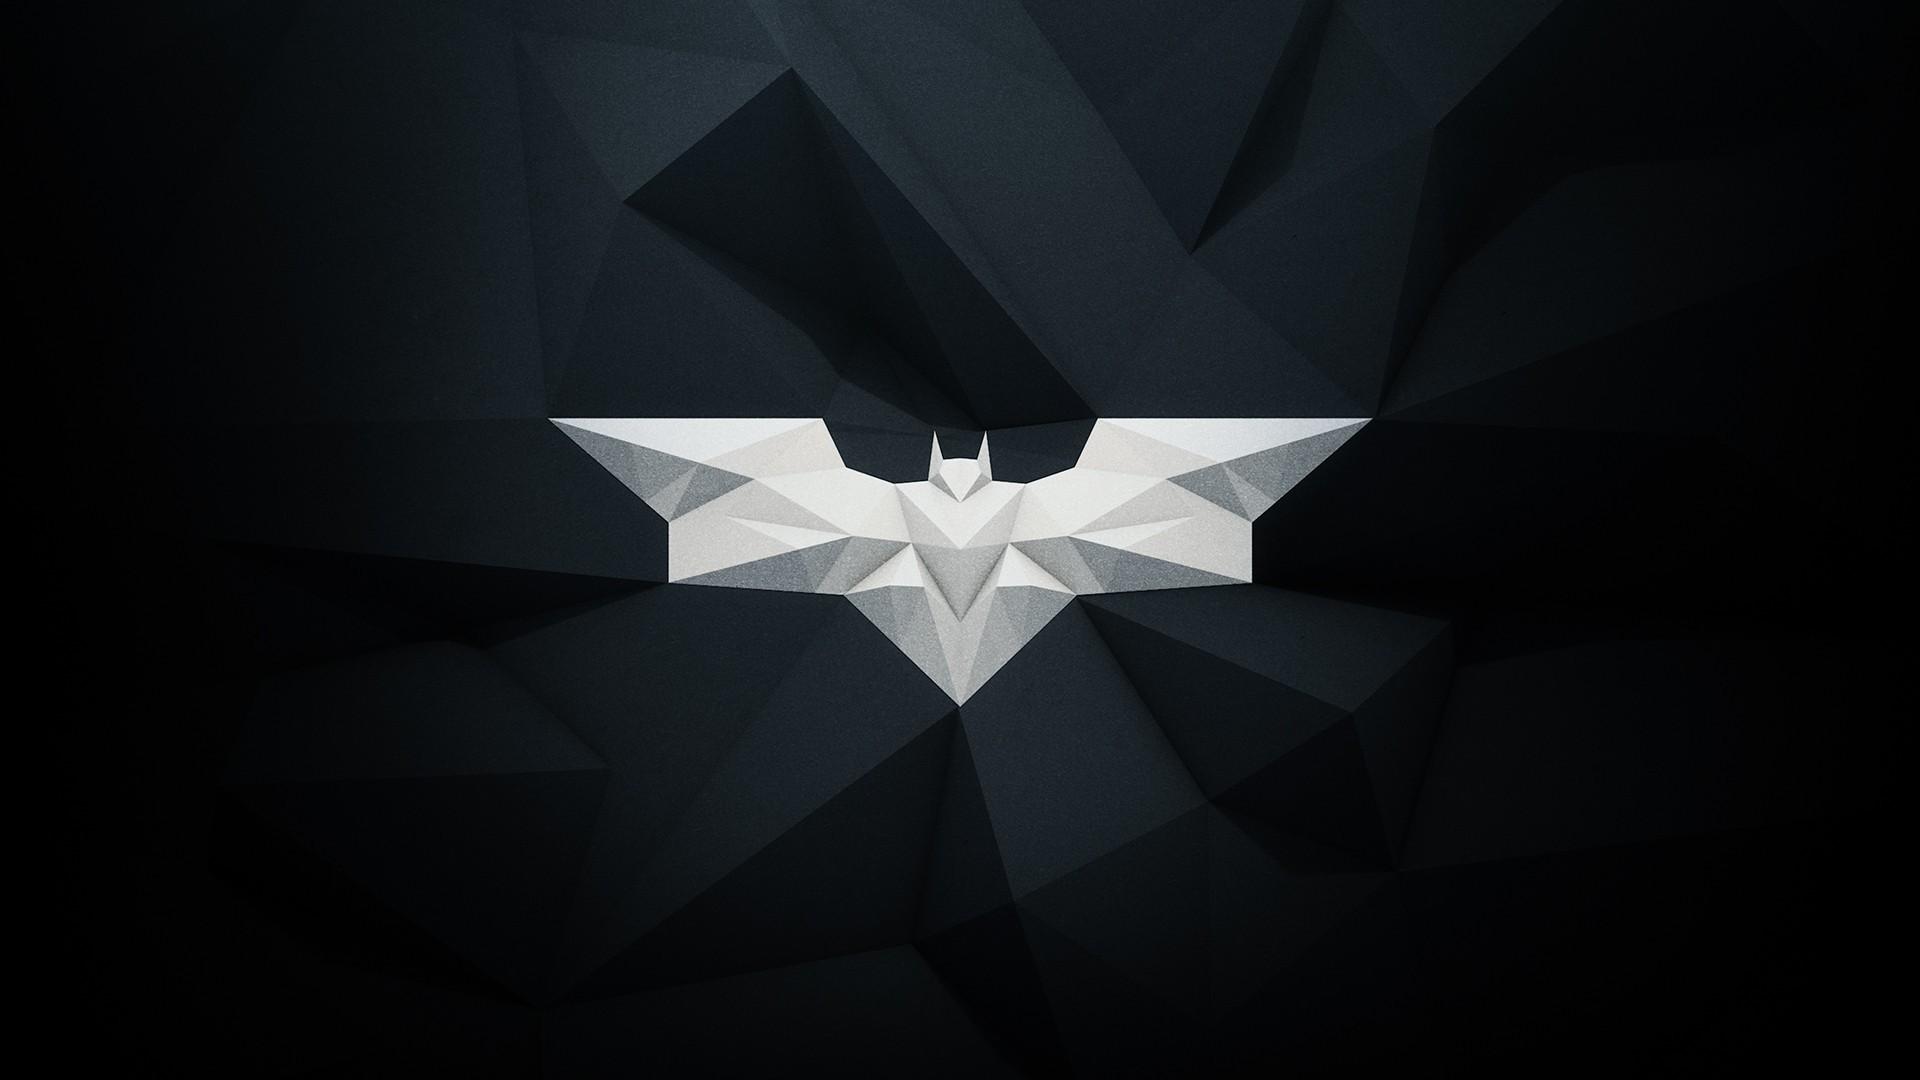 batman logo graphic design, hd artist, 4k wallpapers, images